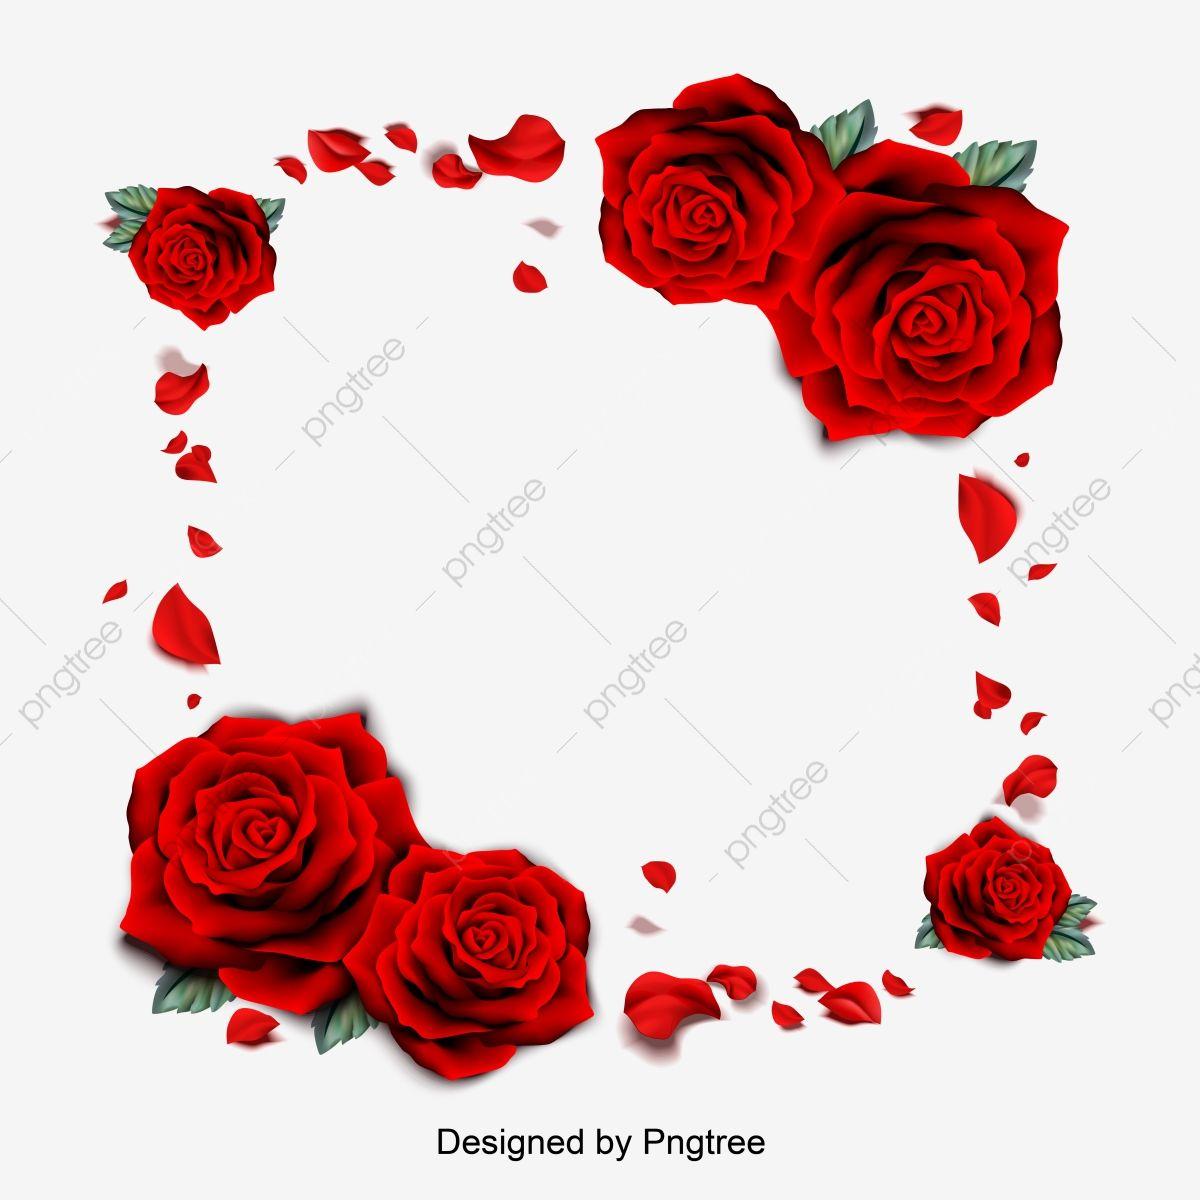 Vector Illustration Of Red Rose Petal Borders Romantic Valentines Day Borders Flower Border Clipart Valentines Day Romantic Png And Vector With Transparent B Valentines Day Border Red Rose Petals Happy Valentines